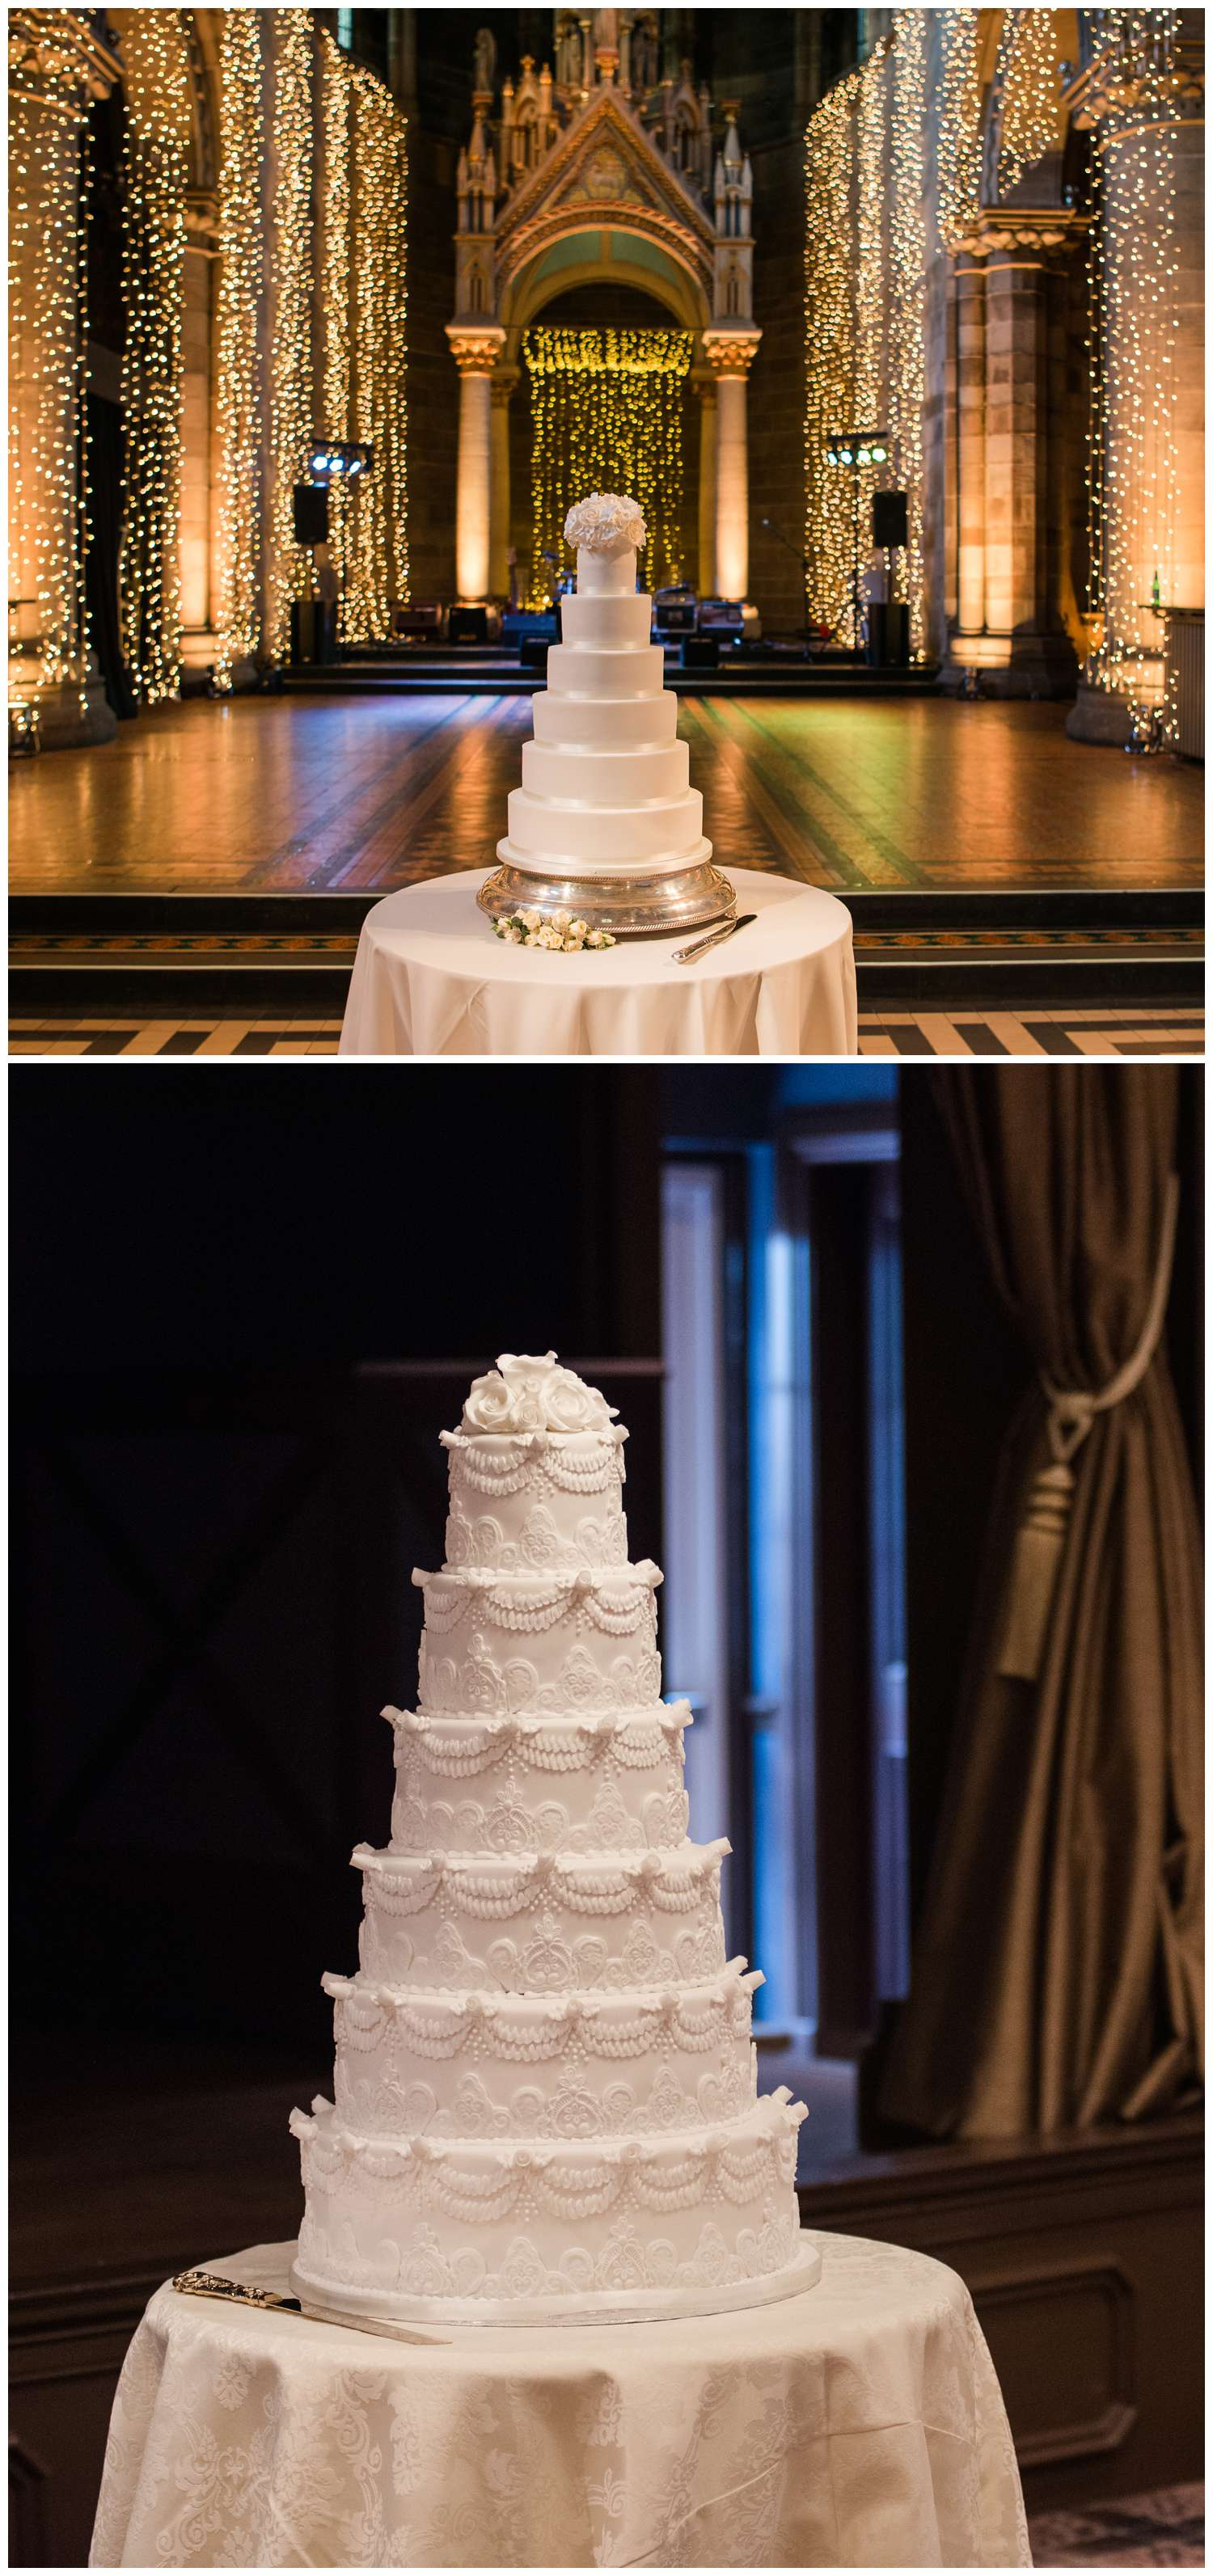 Six-tier wedding cake ideas, ideas for your wedding cake